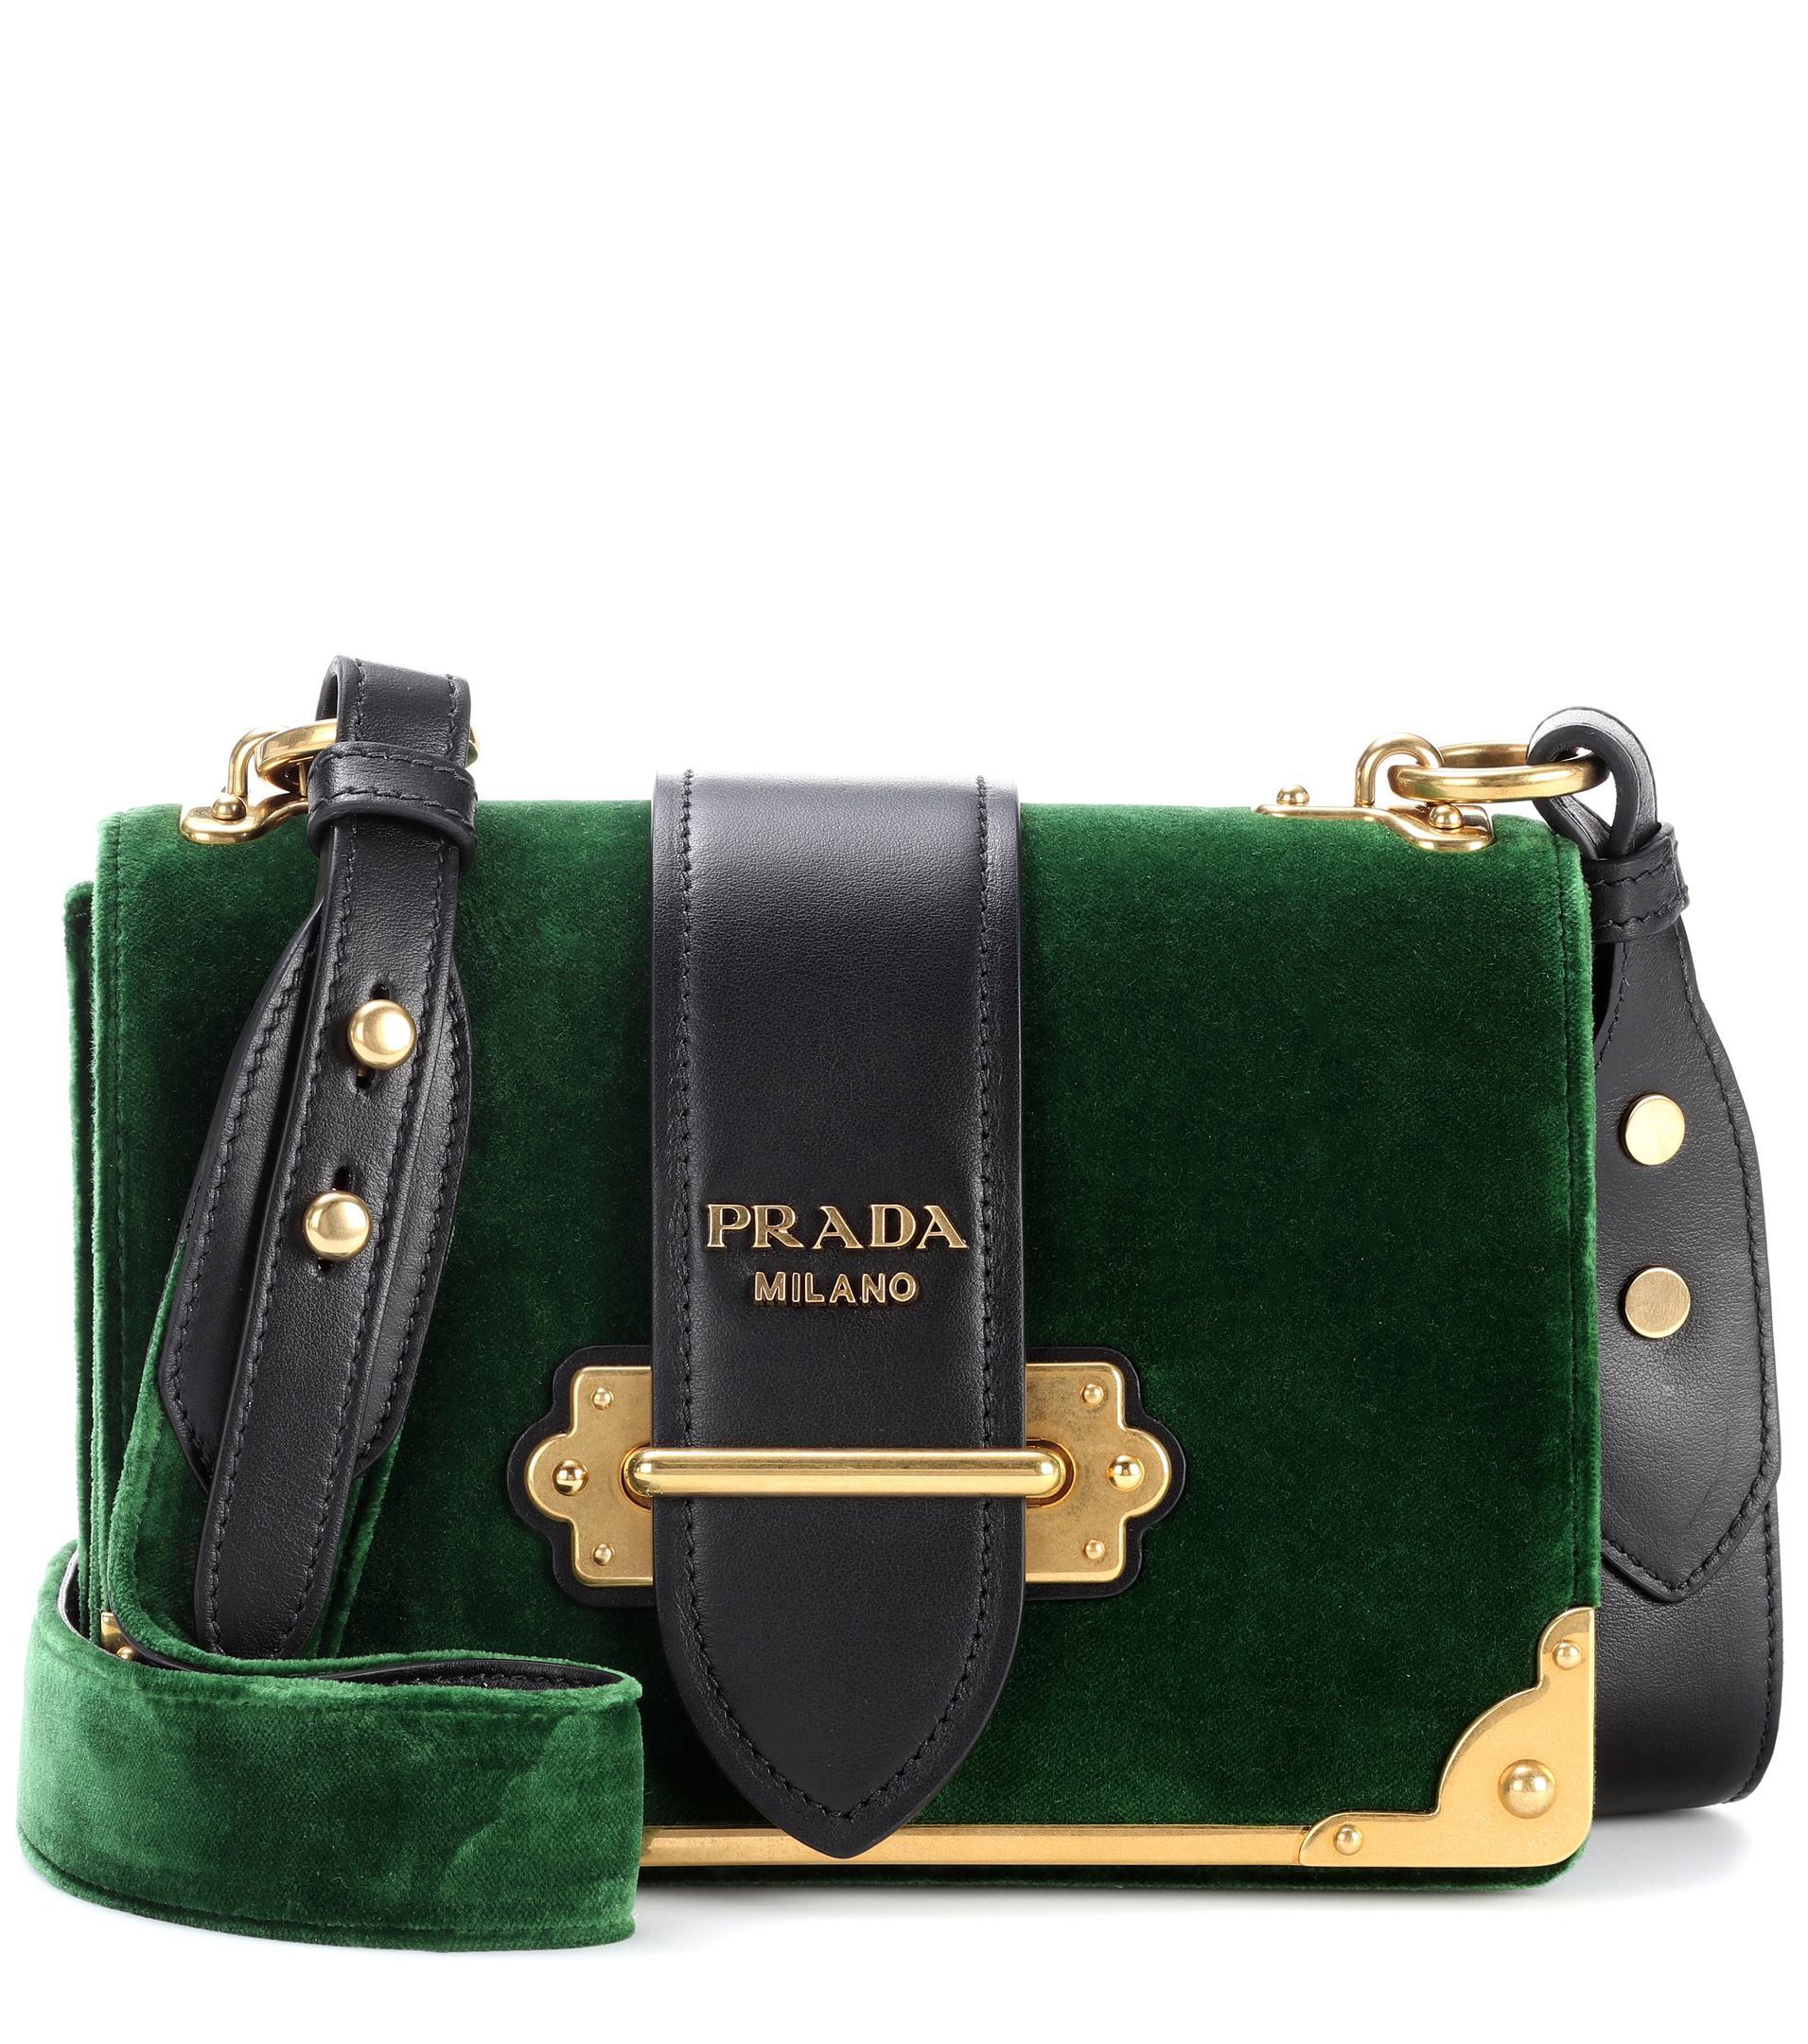 a23e57f805fa02 where can i buy jet set prada red tote 89974 1beaa; cheap lyst prada cahier  velvet shoulder bag in green a129f 9fe09